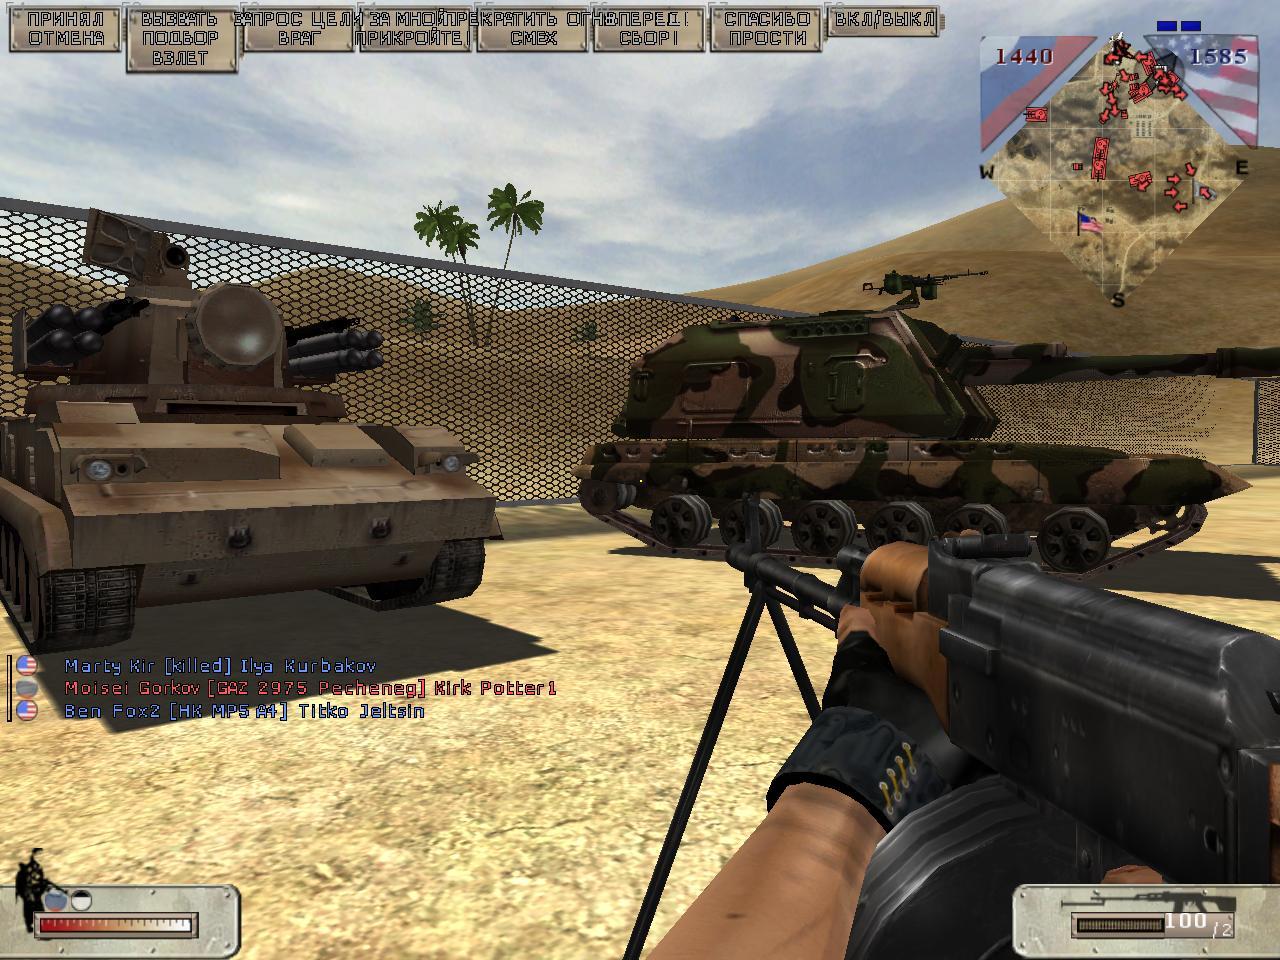 Bfv arsenal mod for battlefield vietnam mod db.